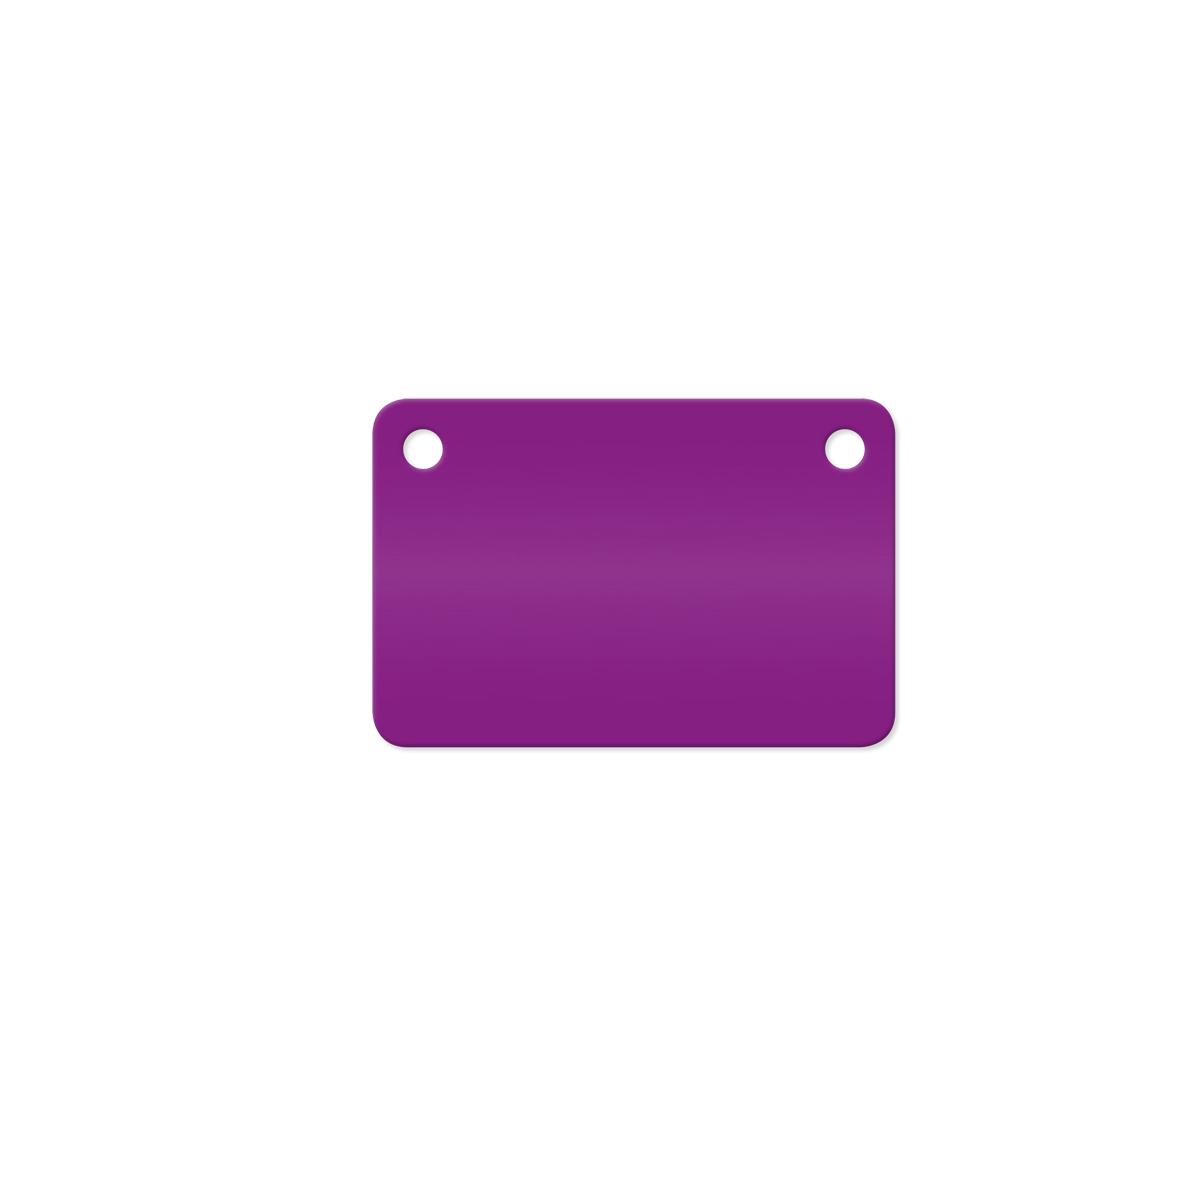 Plastic Tray Tag Image